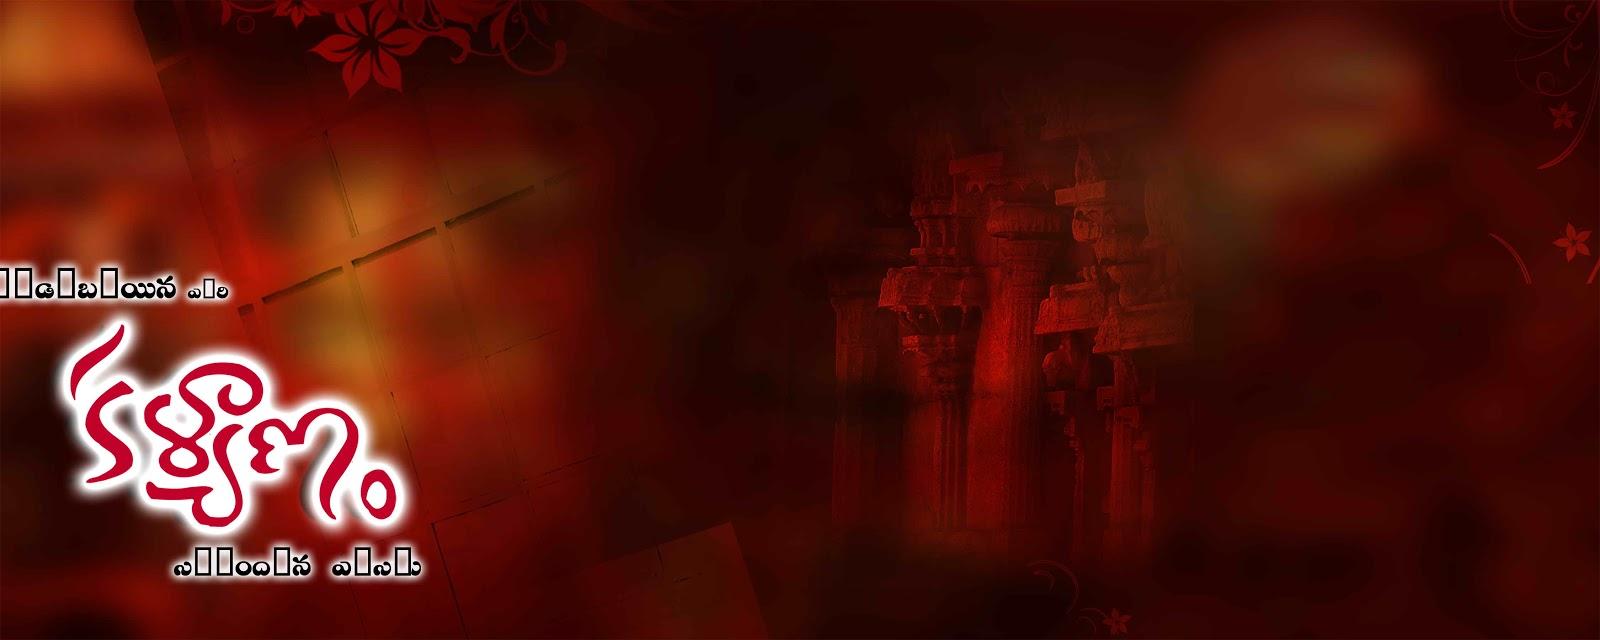 top 8 karizma album background psd files free download 12x36 - studiopk